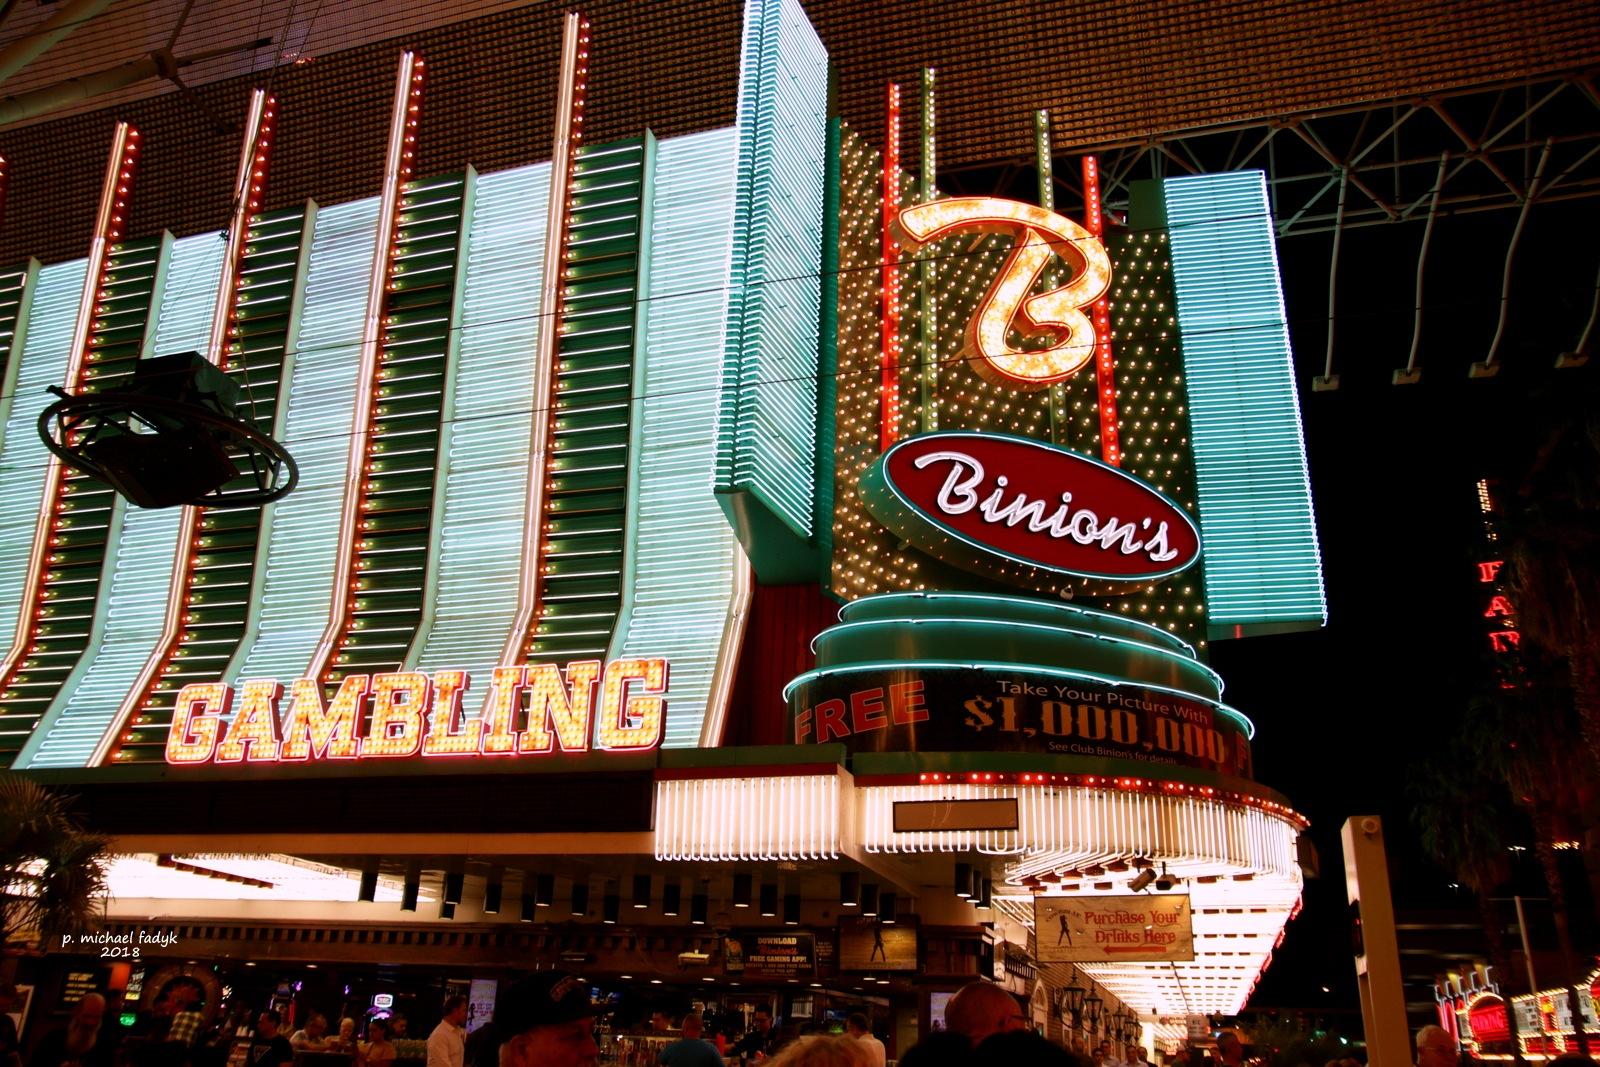 Binion's Gambling House by P. Michael Fadyk